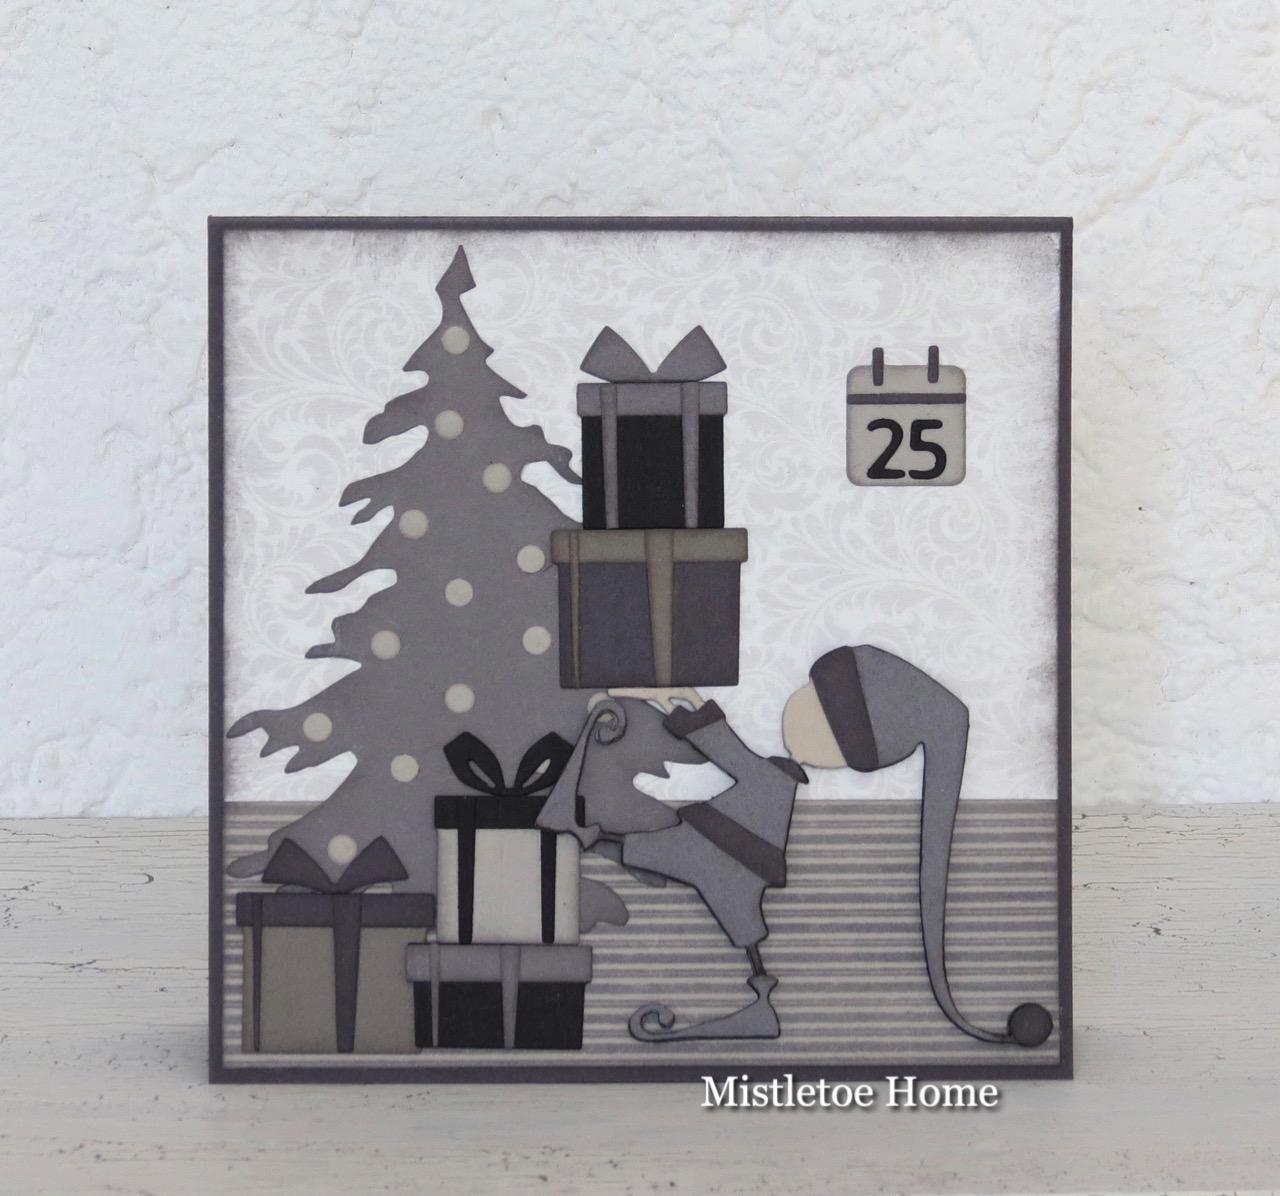 2019 White House Christmas Card.Mistletoe Home Black And White Christmas Card With An Elf